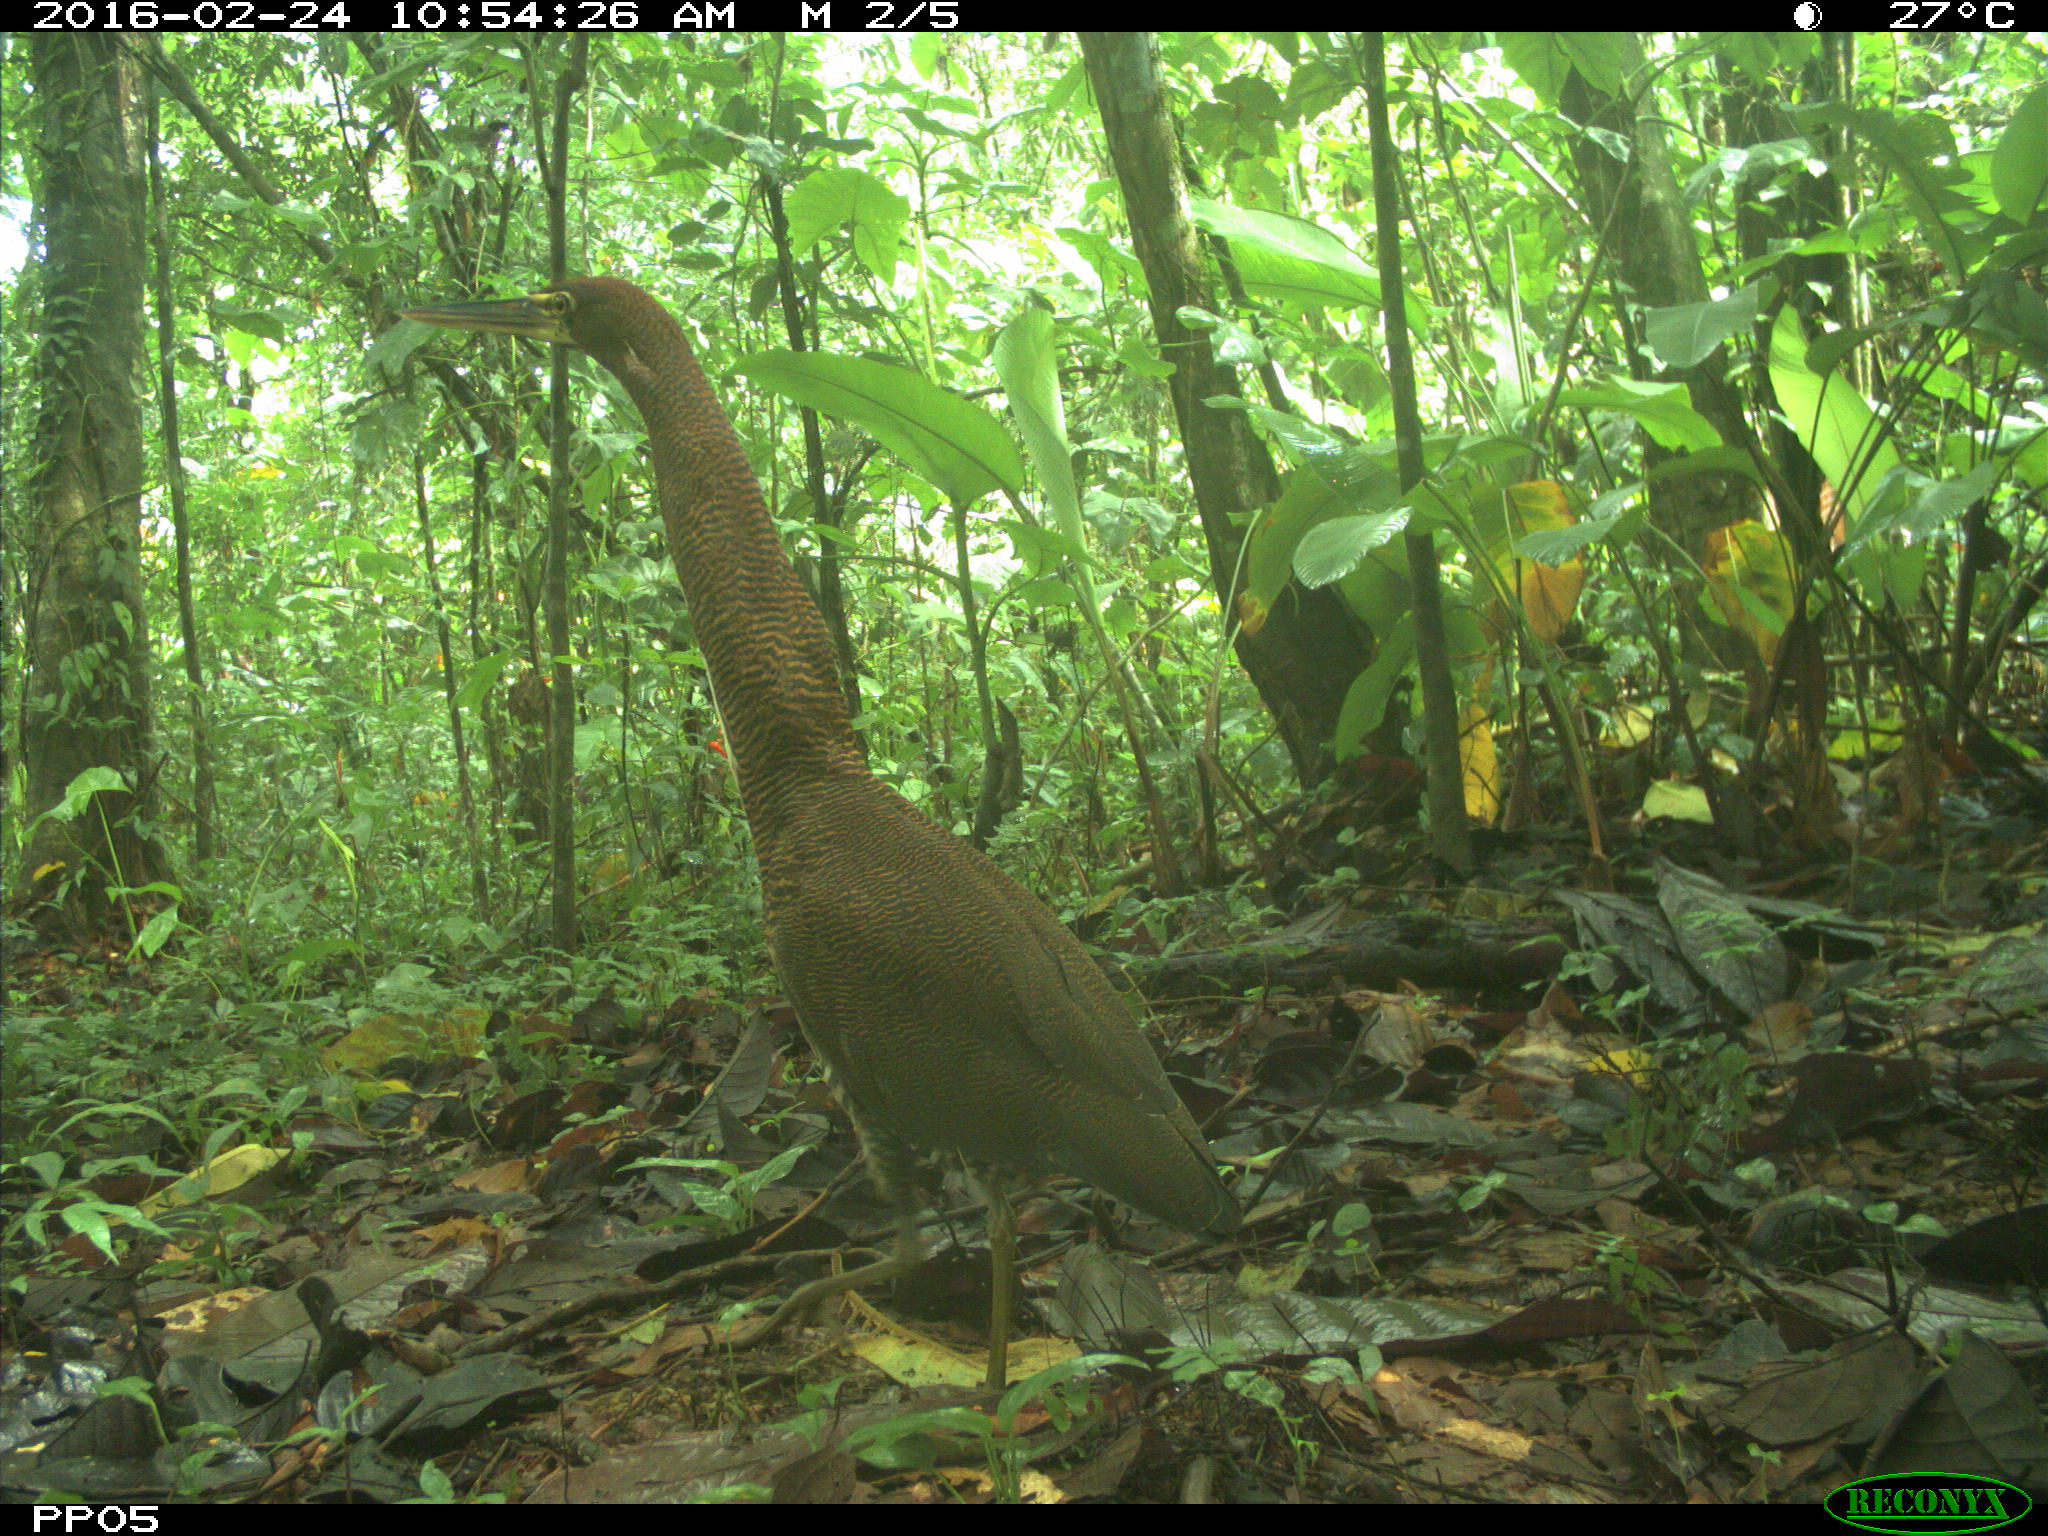 Other Bird species